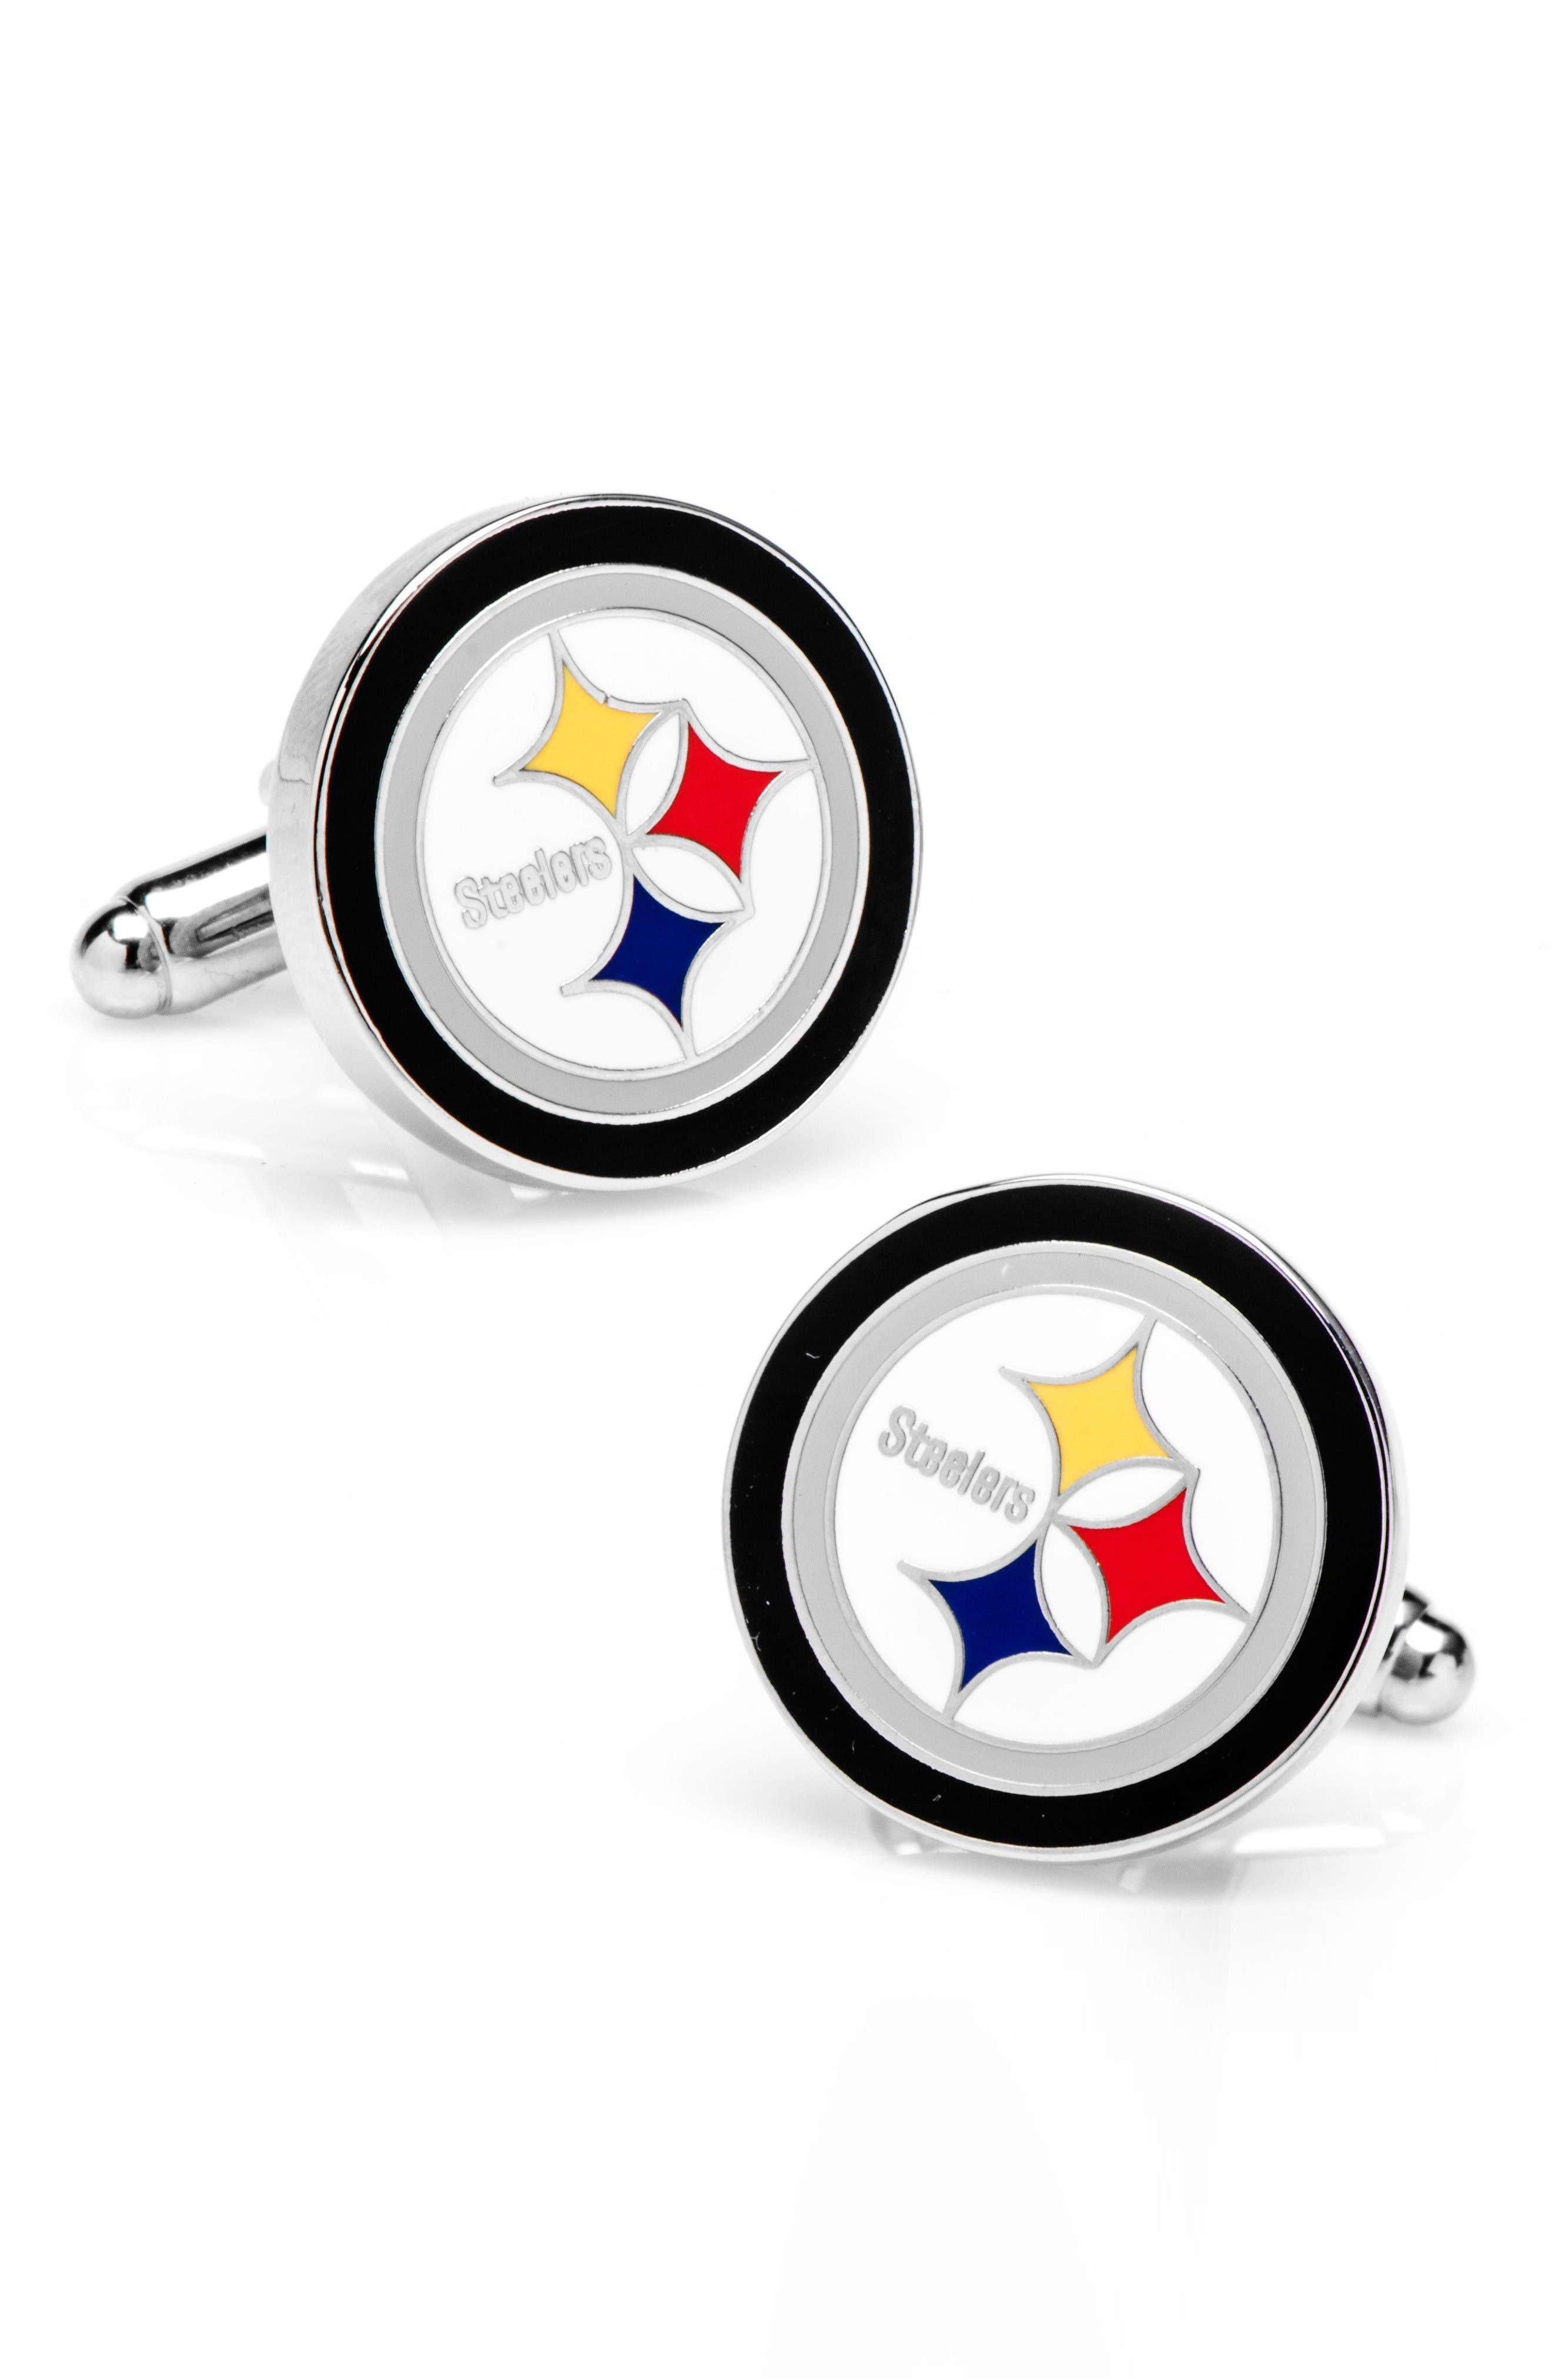 CUFFLINKS, INC. Pittsburgh Steelers Cuff Links